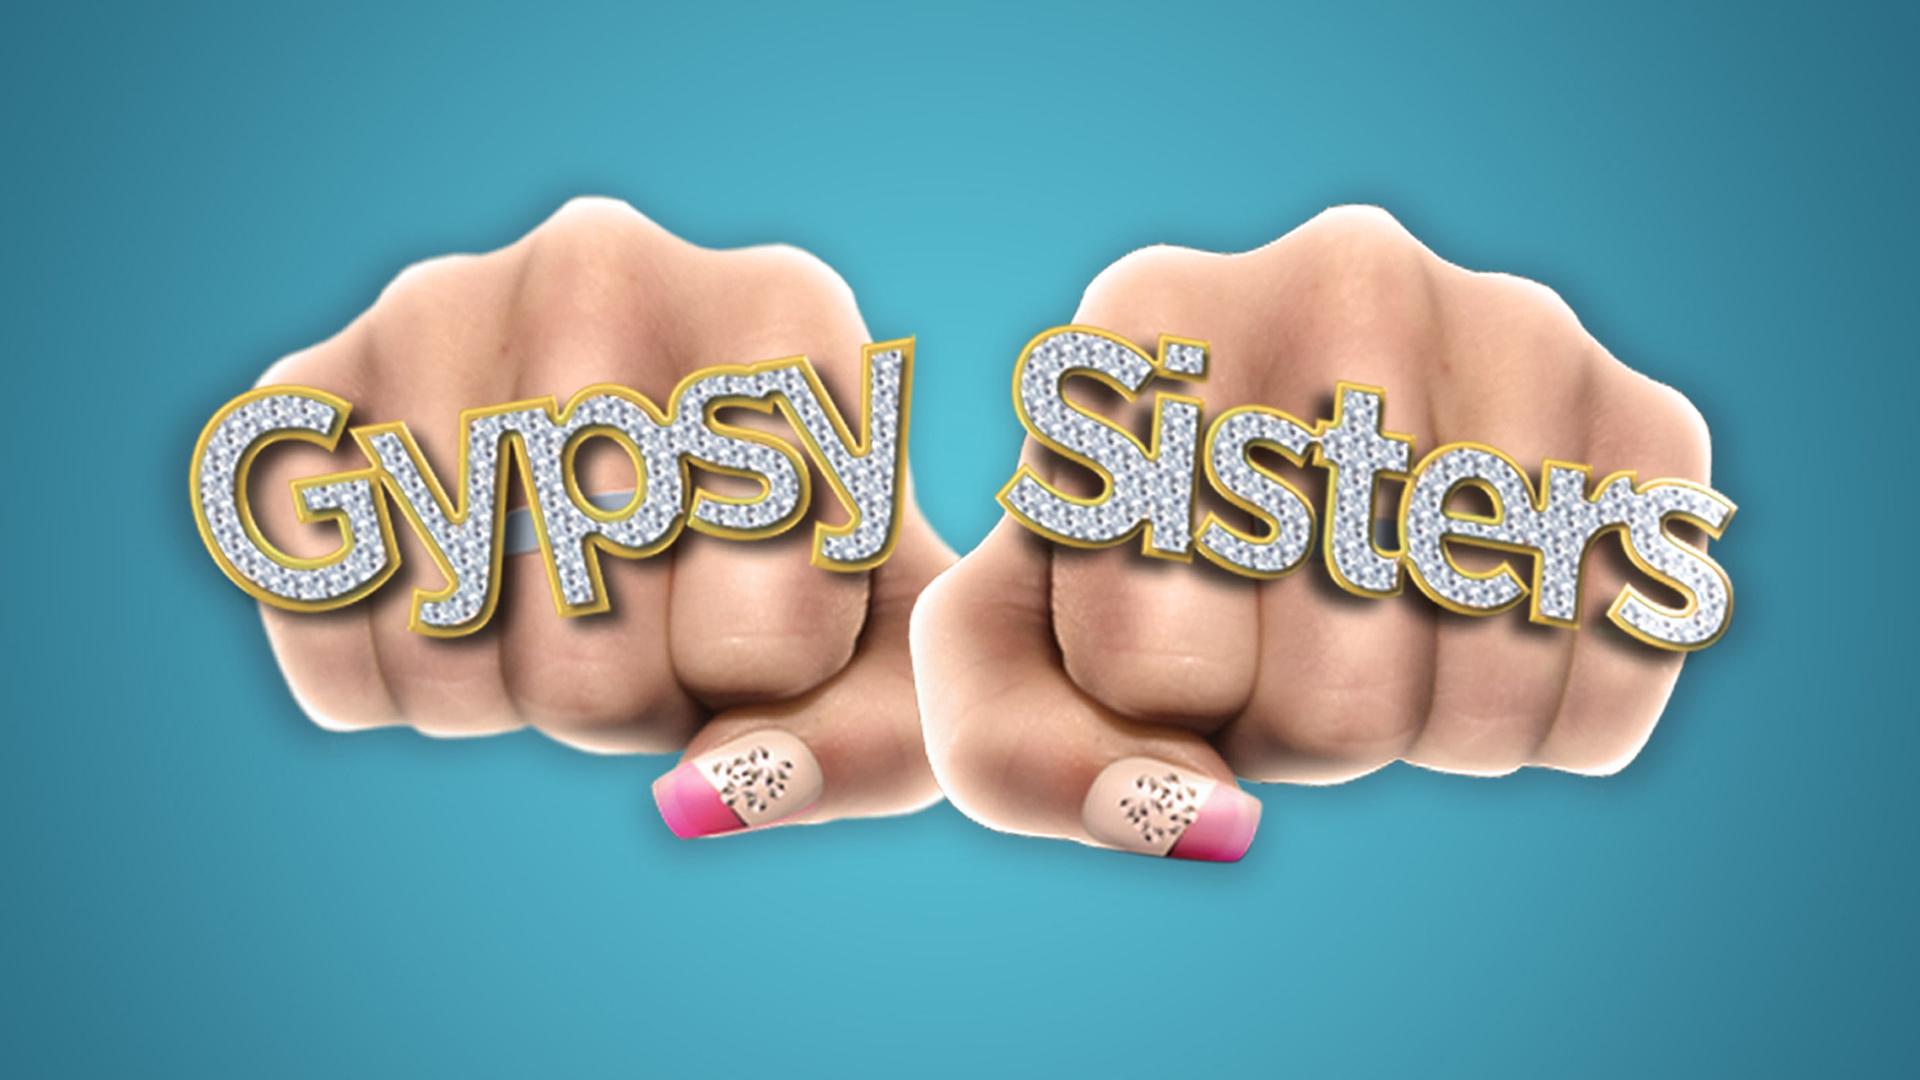 Gypsy Sisters - Season 1